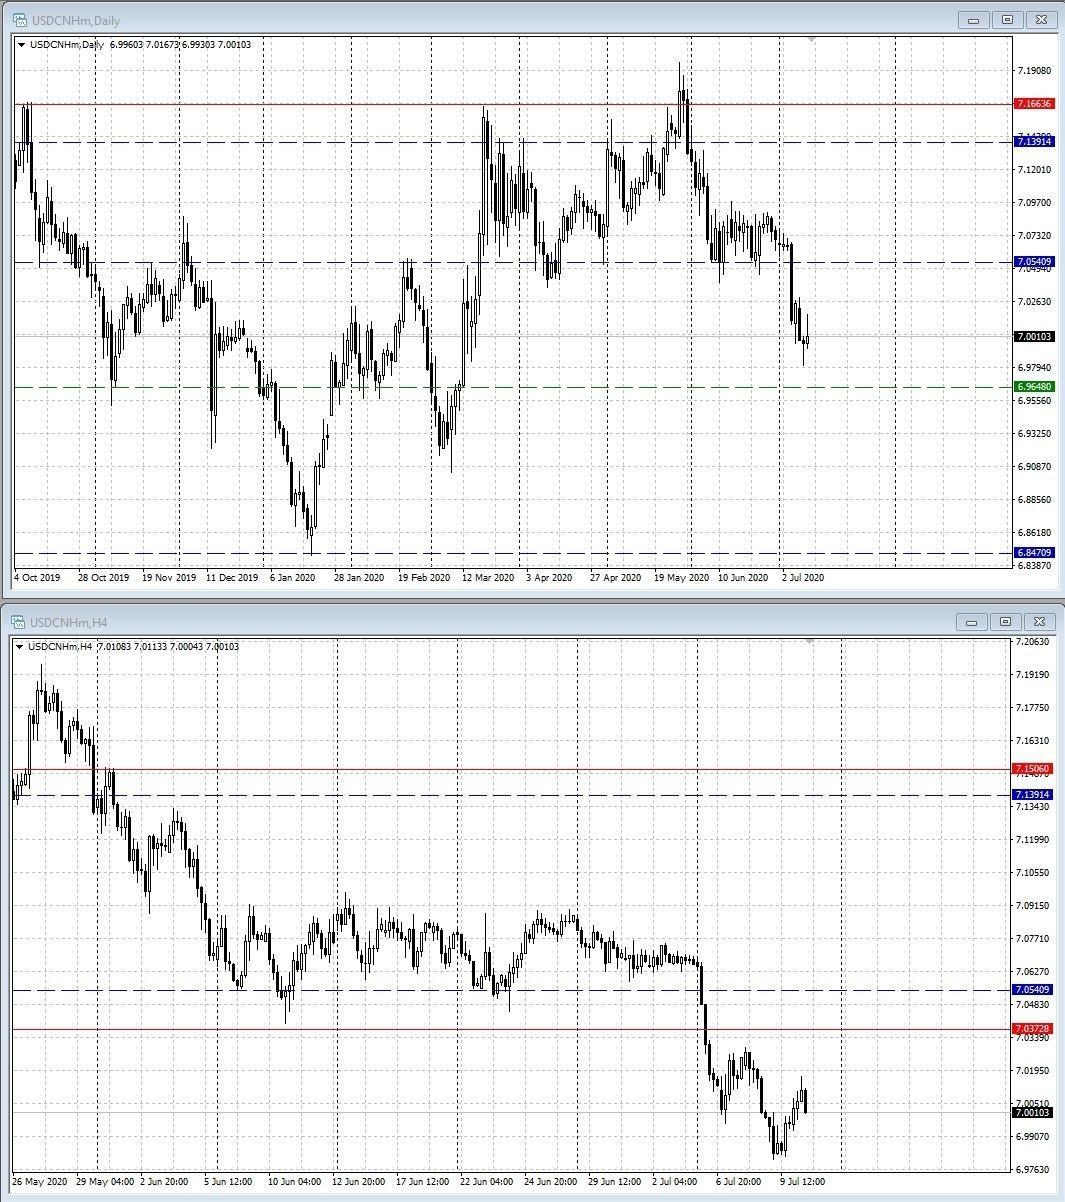 USD/CNH